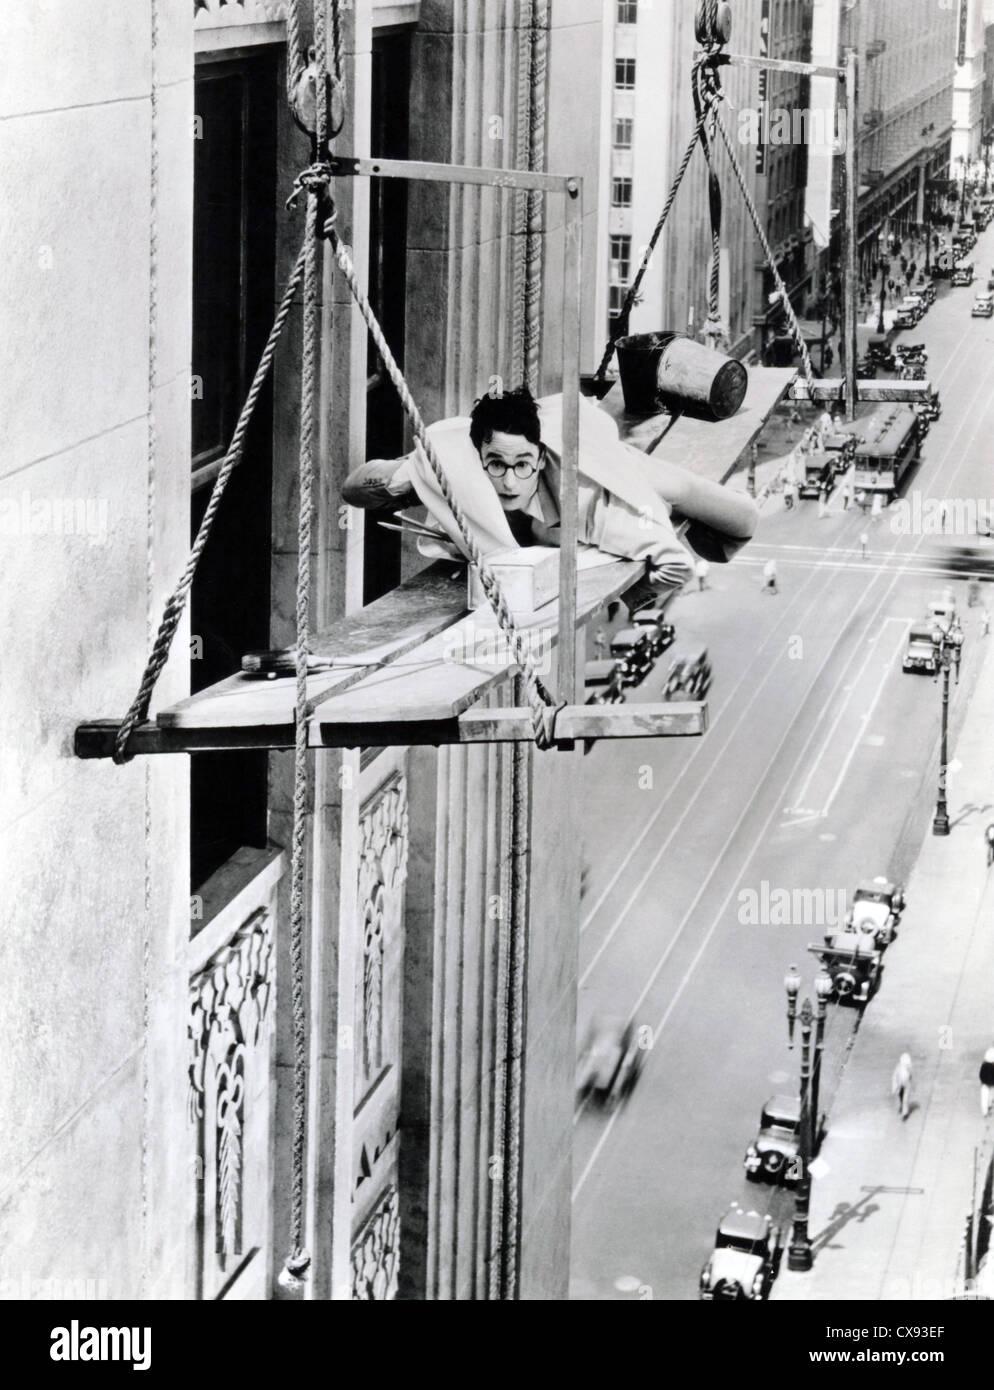 FEET FIRST (1930) HAROLD LLOYD CLYDE BRUCKMAN (DIR) FFST 001 MOVIESTORE COLLECTION LTD - Stock Image